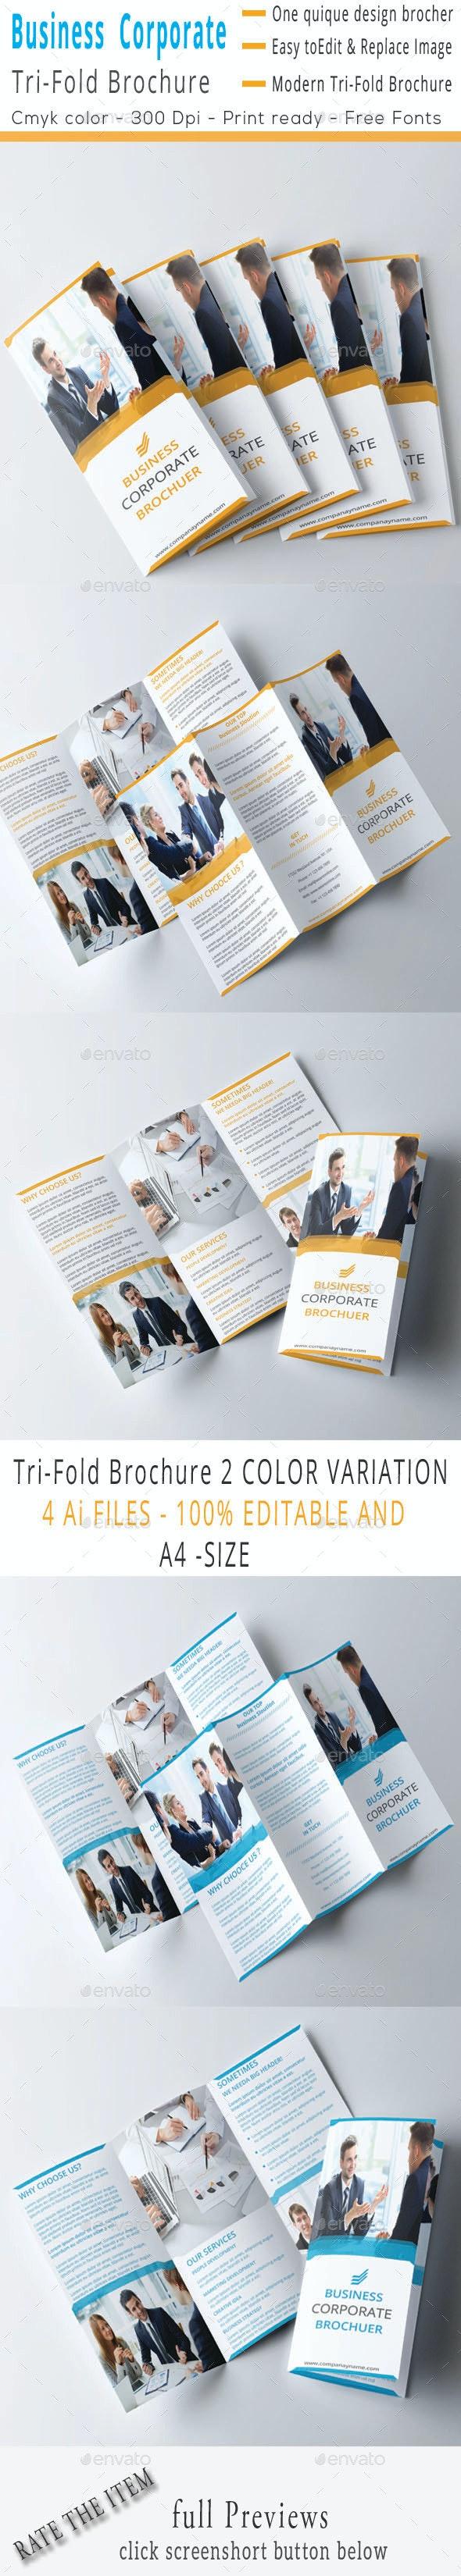 Corporate Business Marketing Tri-Fold Brochure - Corporate Brochures